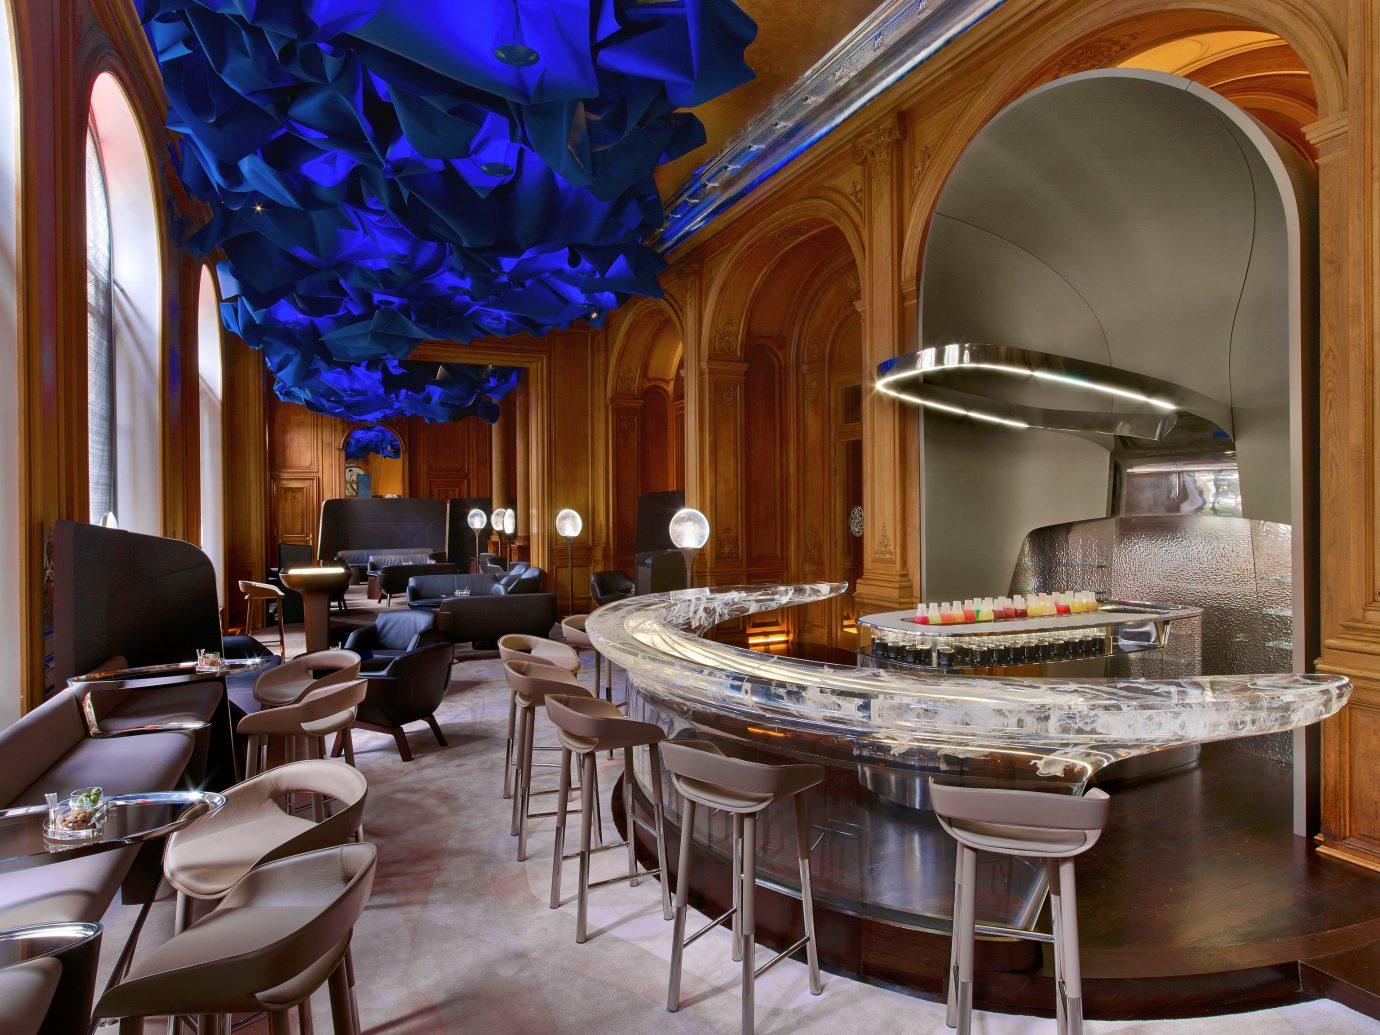 Romance Trip Ideas indoor floor room estate interior design home restaurant meal